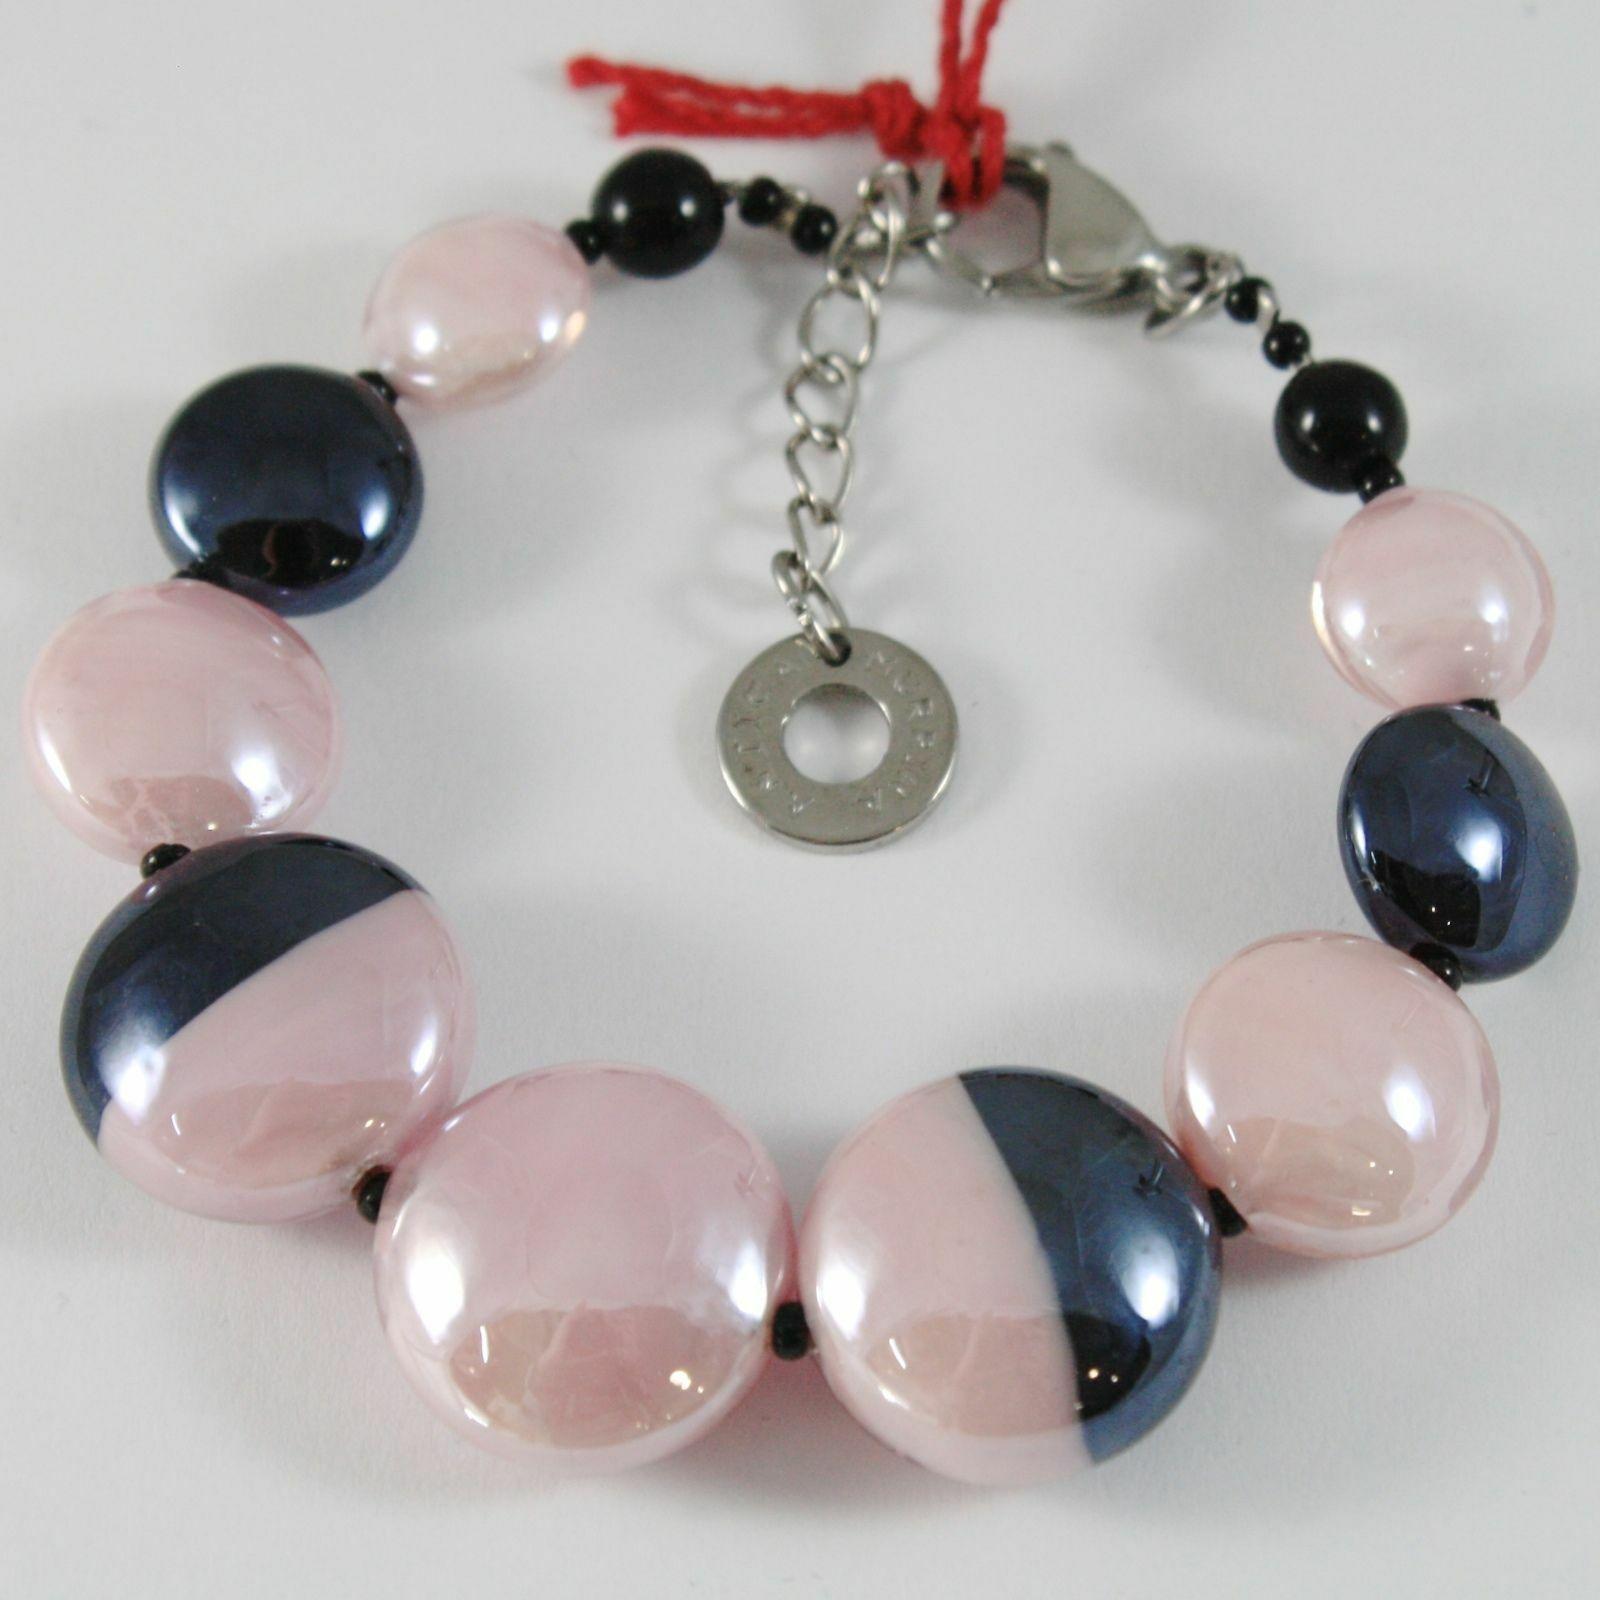 Bracelet Antica Murrina Venezia with Murano Glass Pink and Black BR759A03